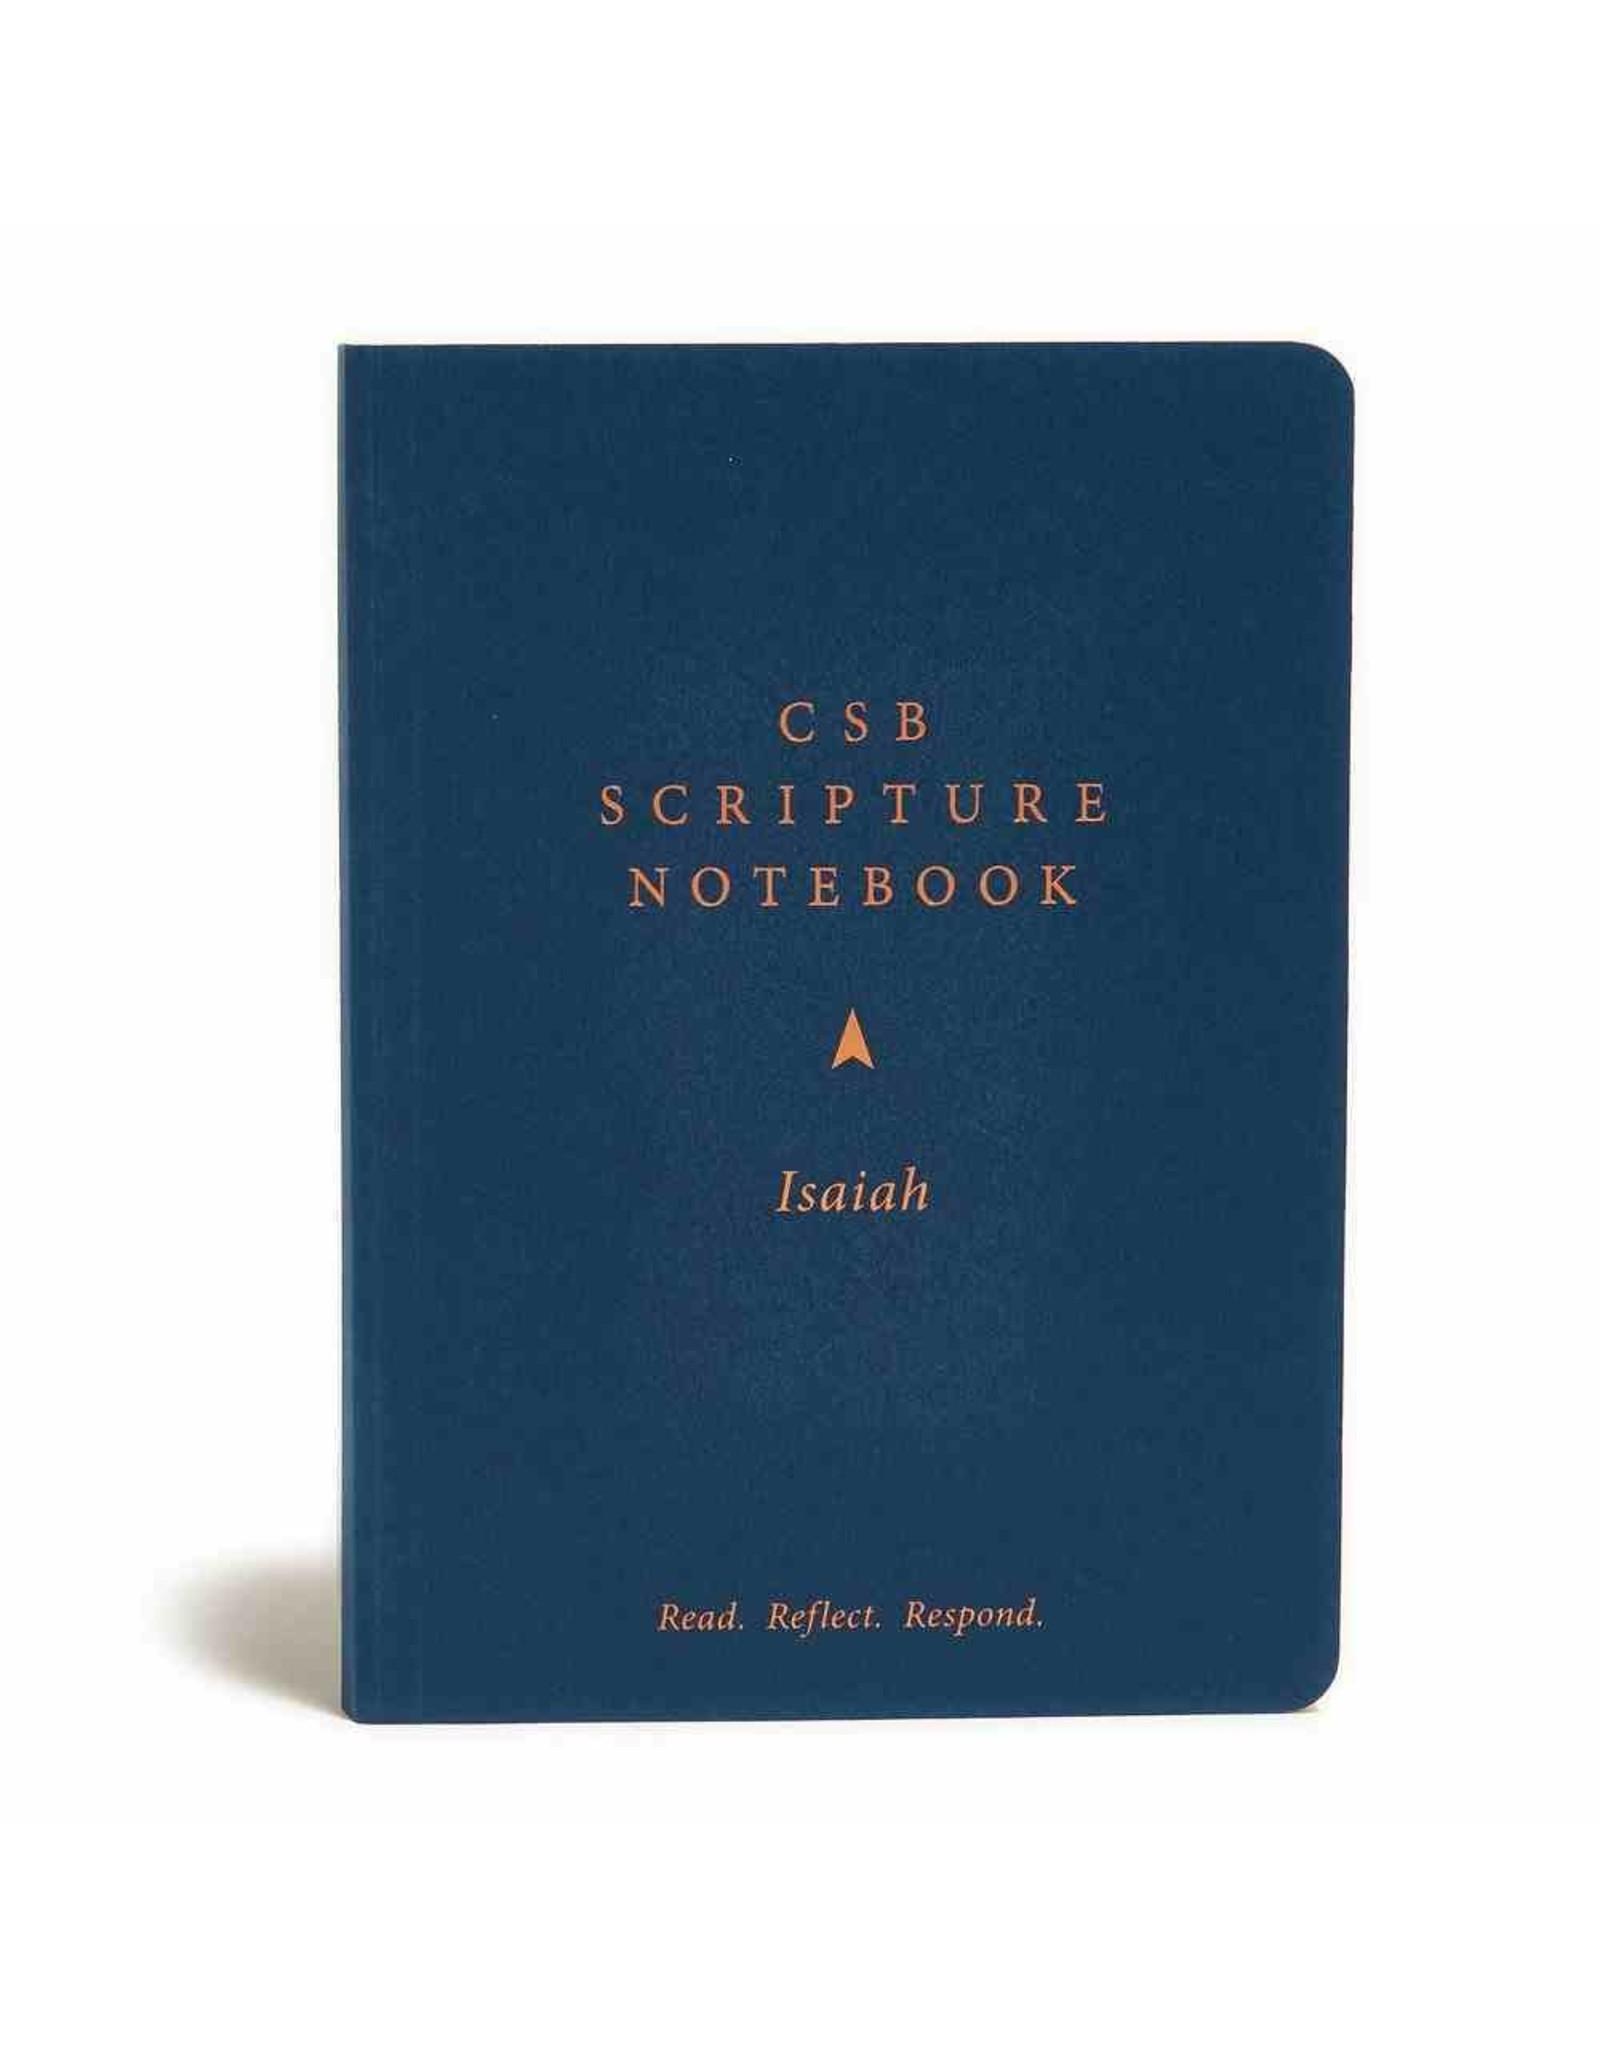 Holman CSB Scripture Notebook - Isaiah